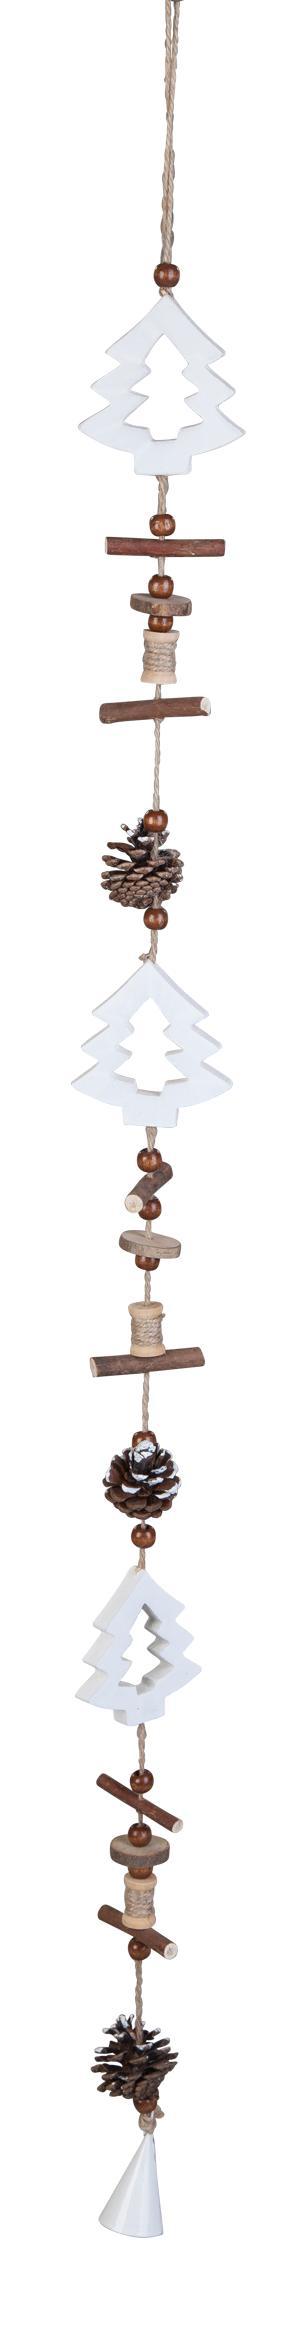 dekoh nger tannenbaum aus holz 95 cm g nstig online kaufen. Black Bedroom Furniture Sets. Home Design Ideas